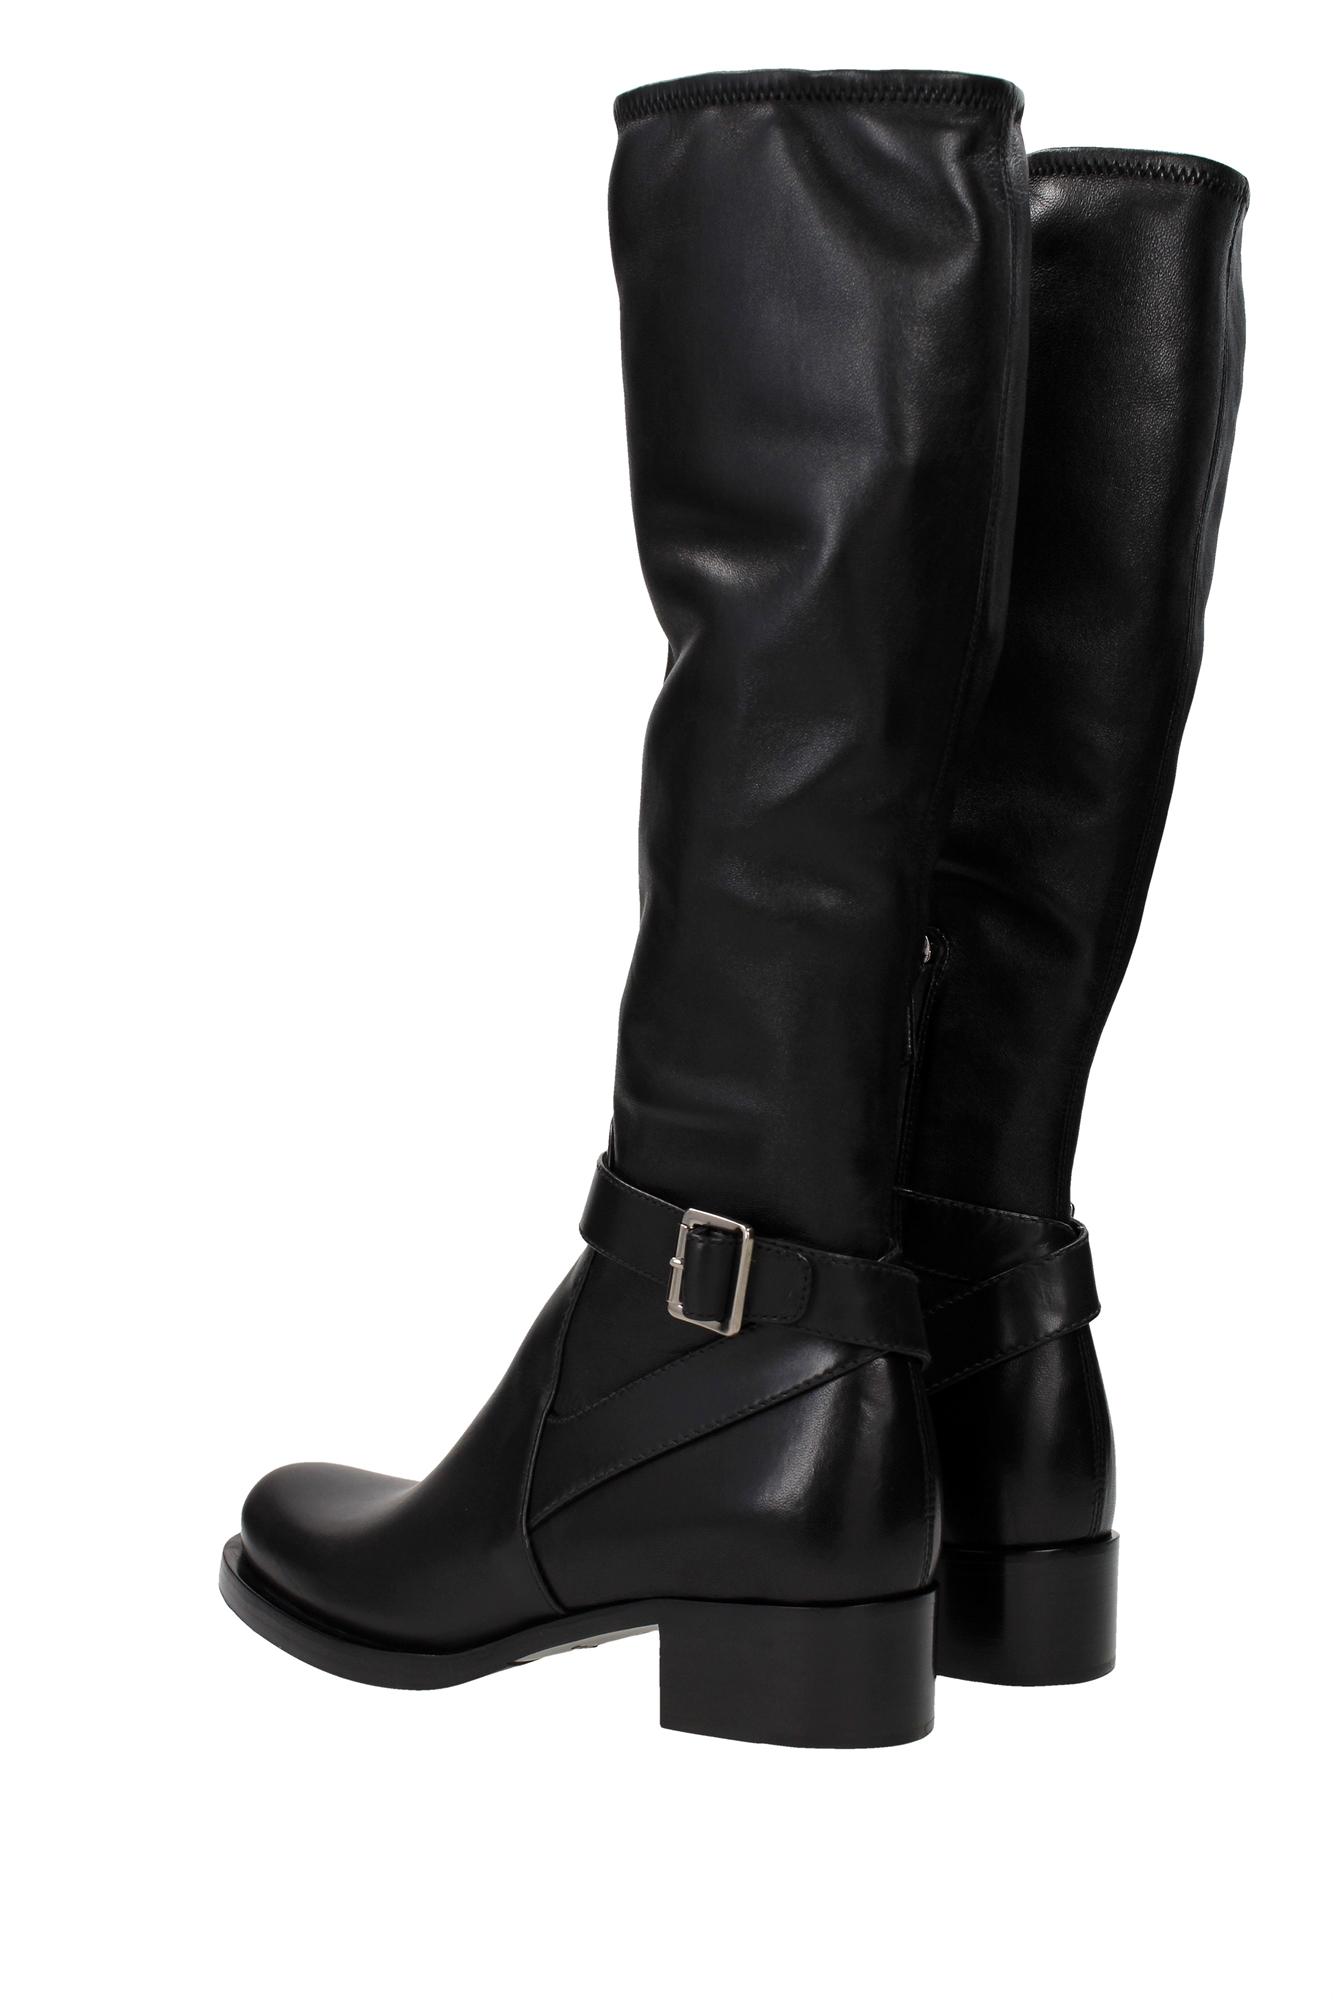 boots prada leather black 1w087gnero ebay